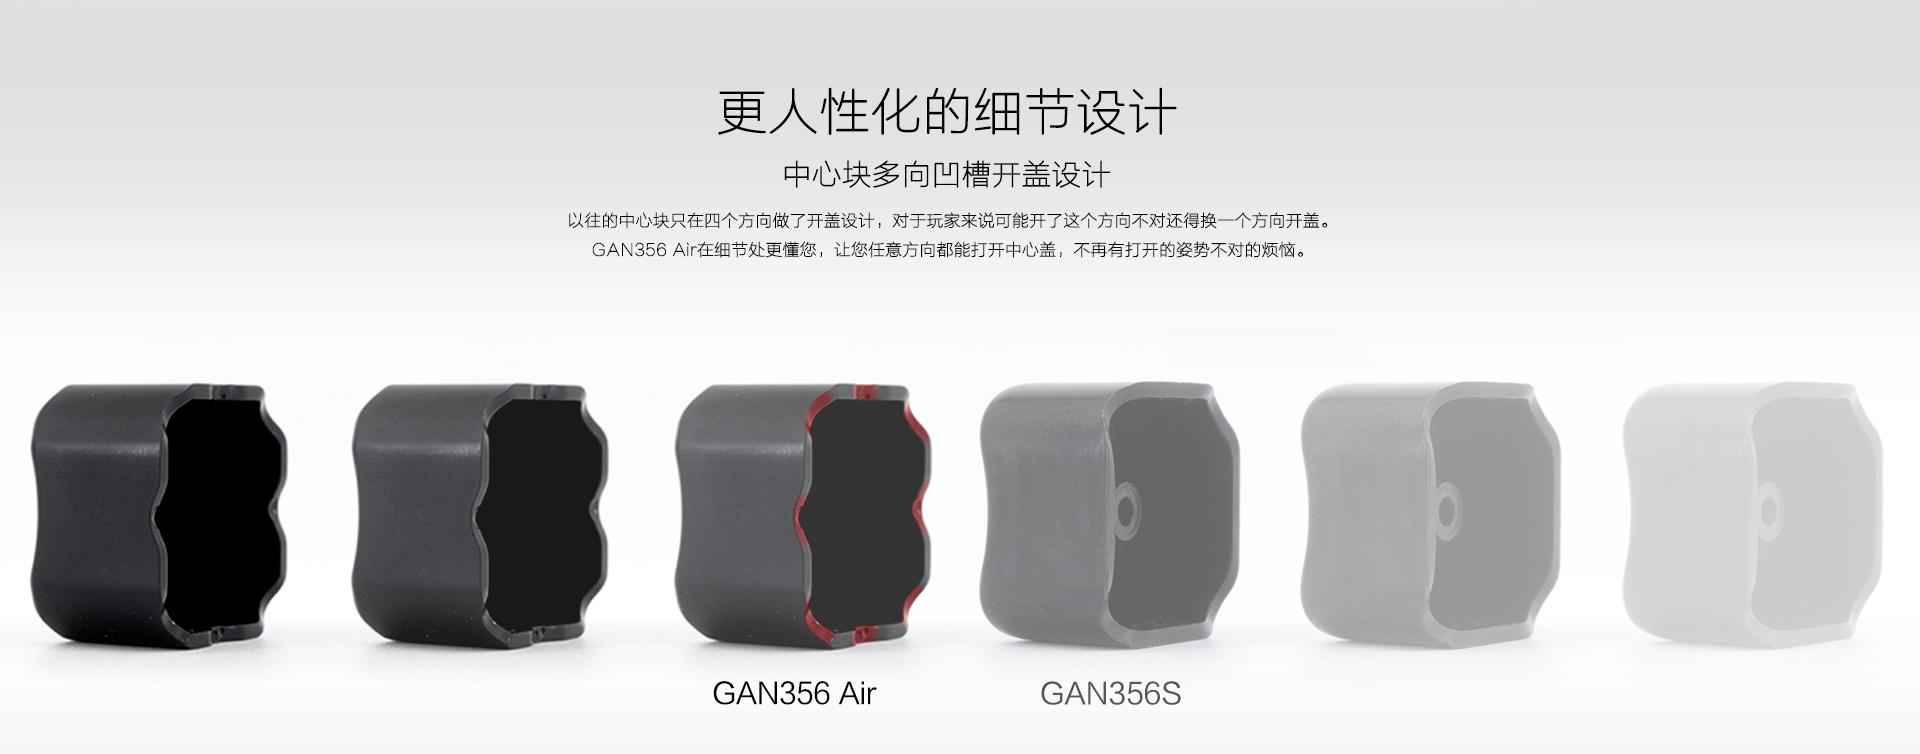 GAN356-Air-图文详情二_08